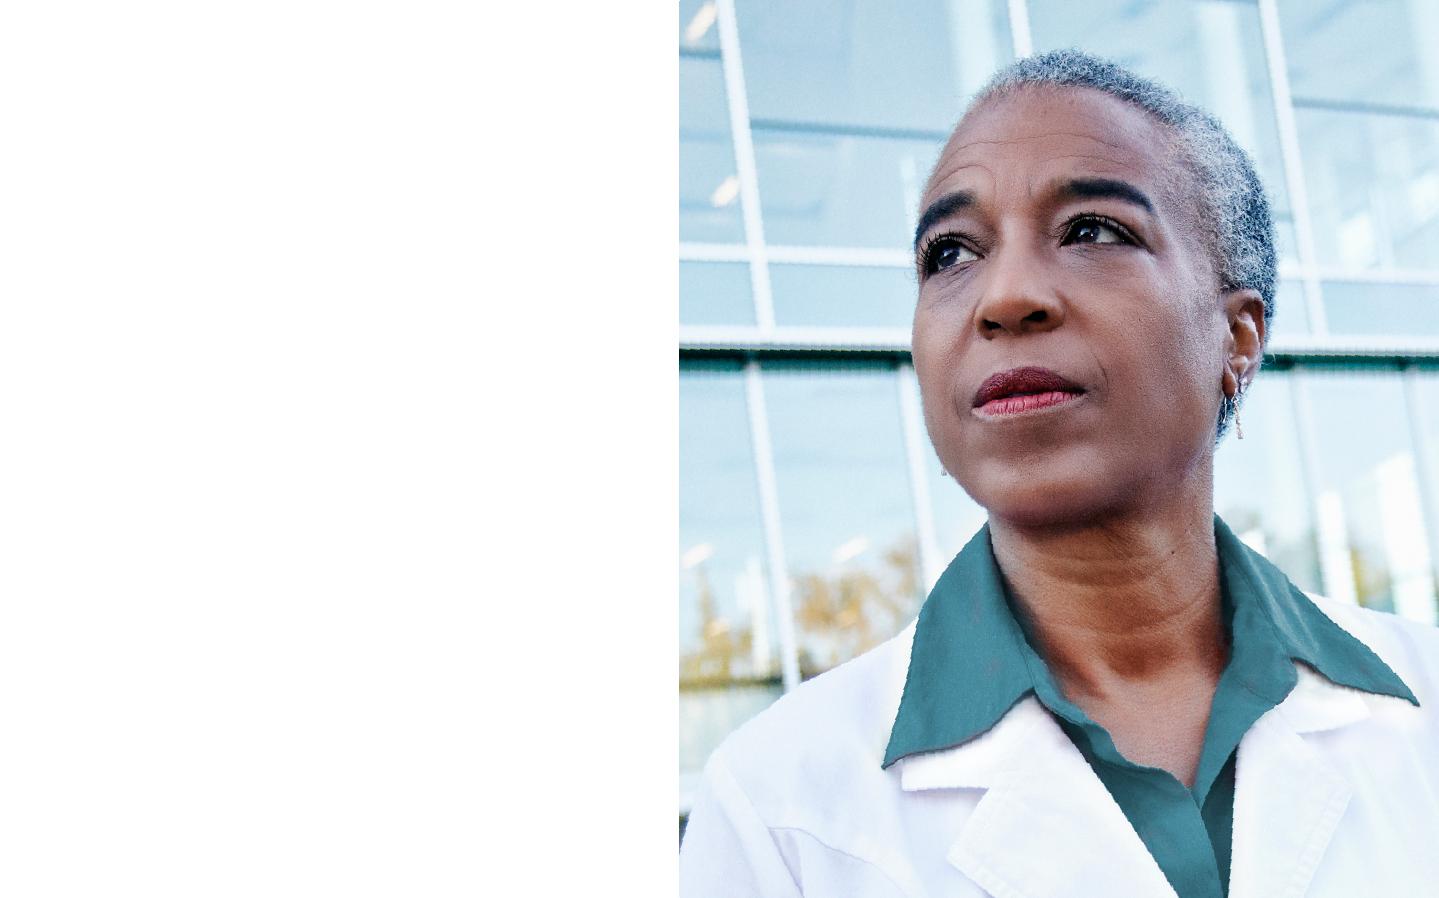 Vivity Female Surgeon